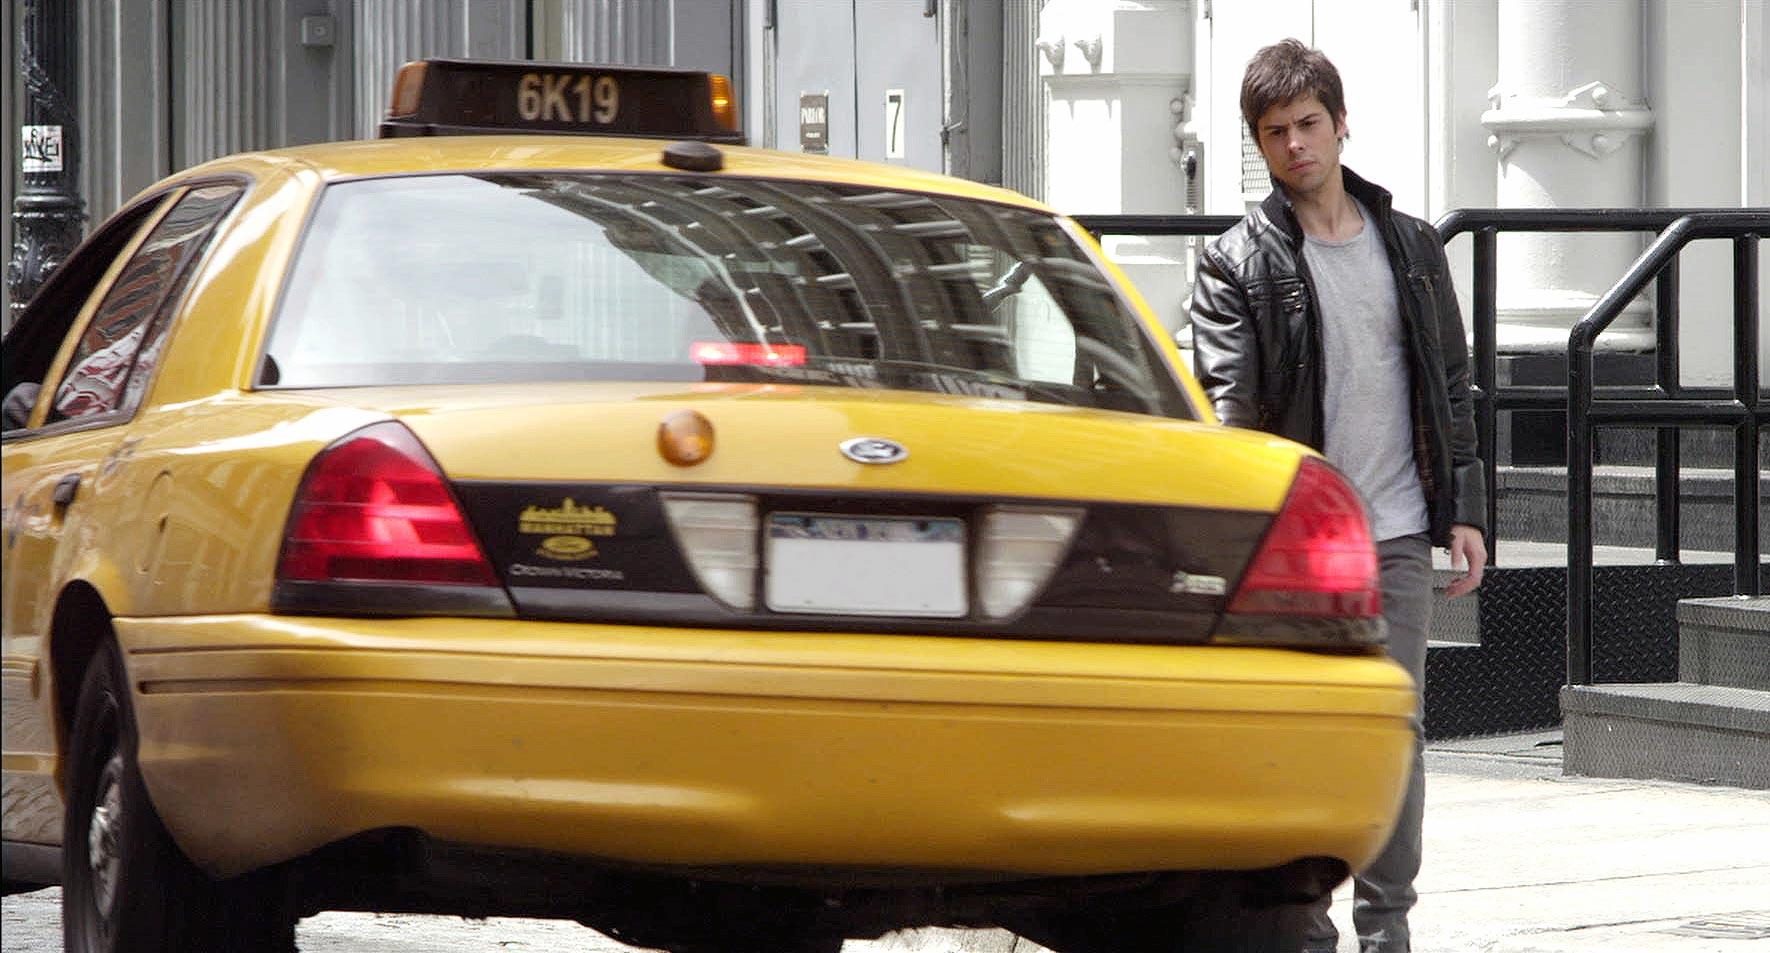 antonio rivas taxi